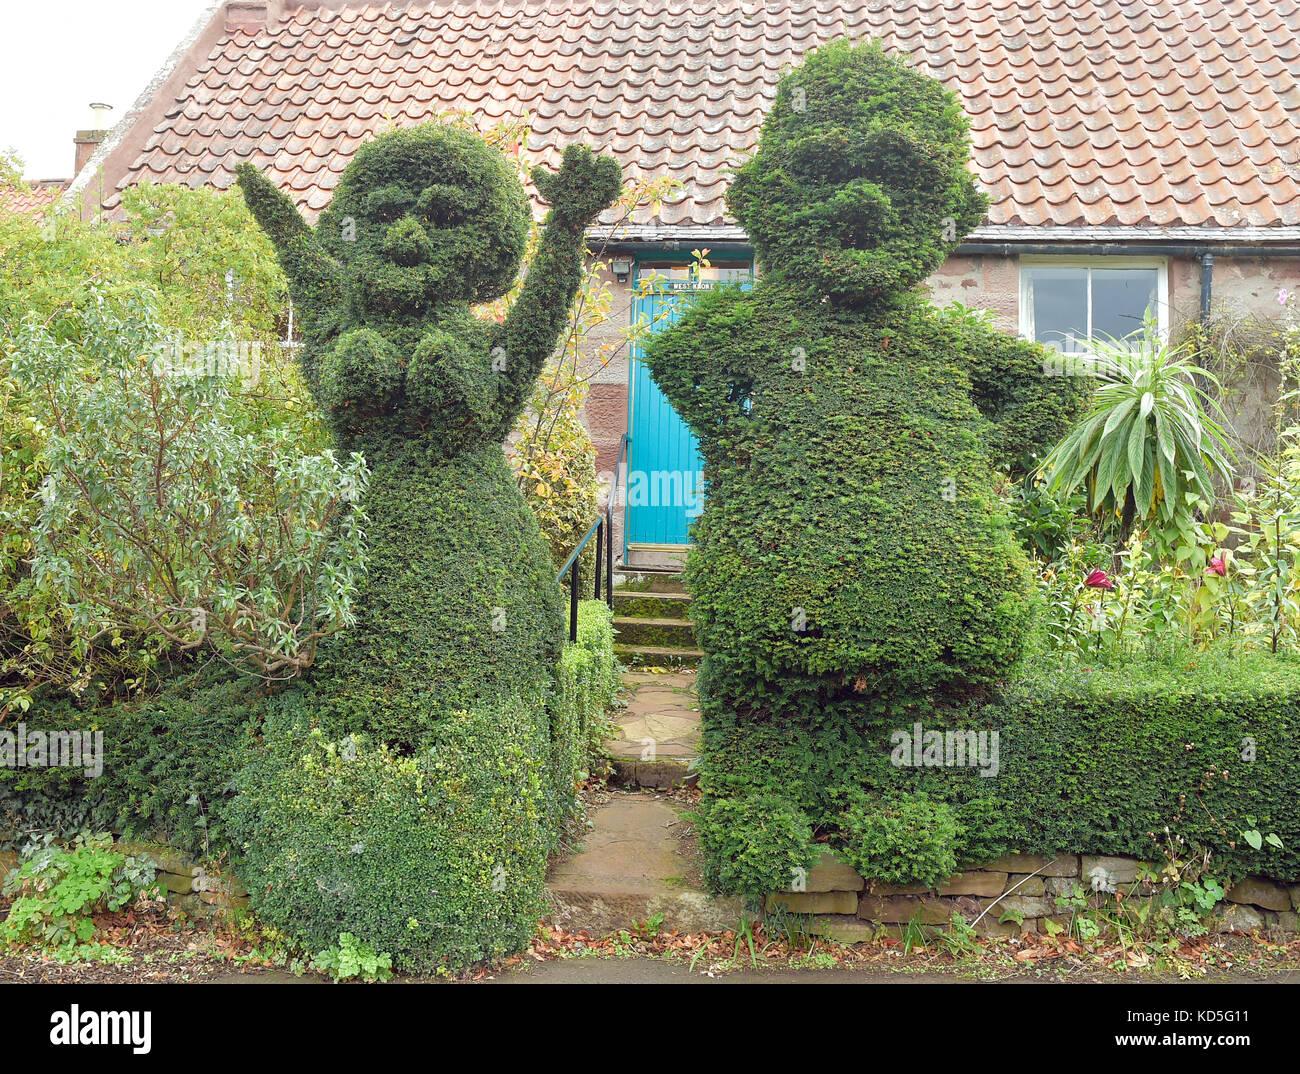 Stenton village, East Lothian garden hedge - Stock Image